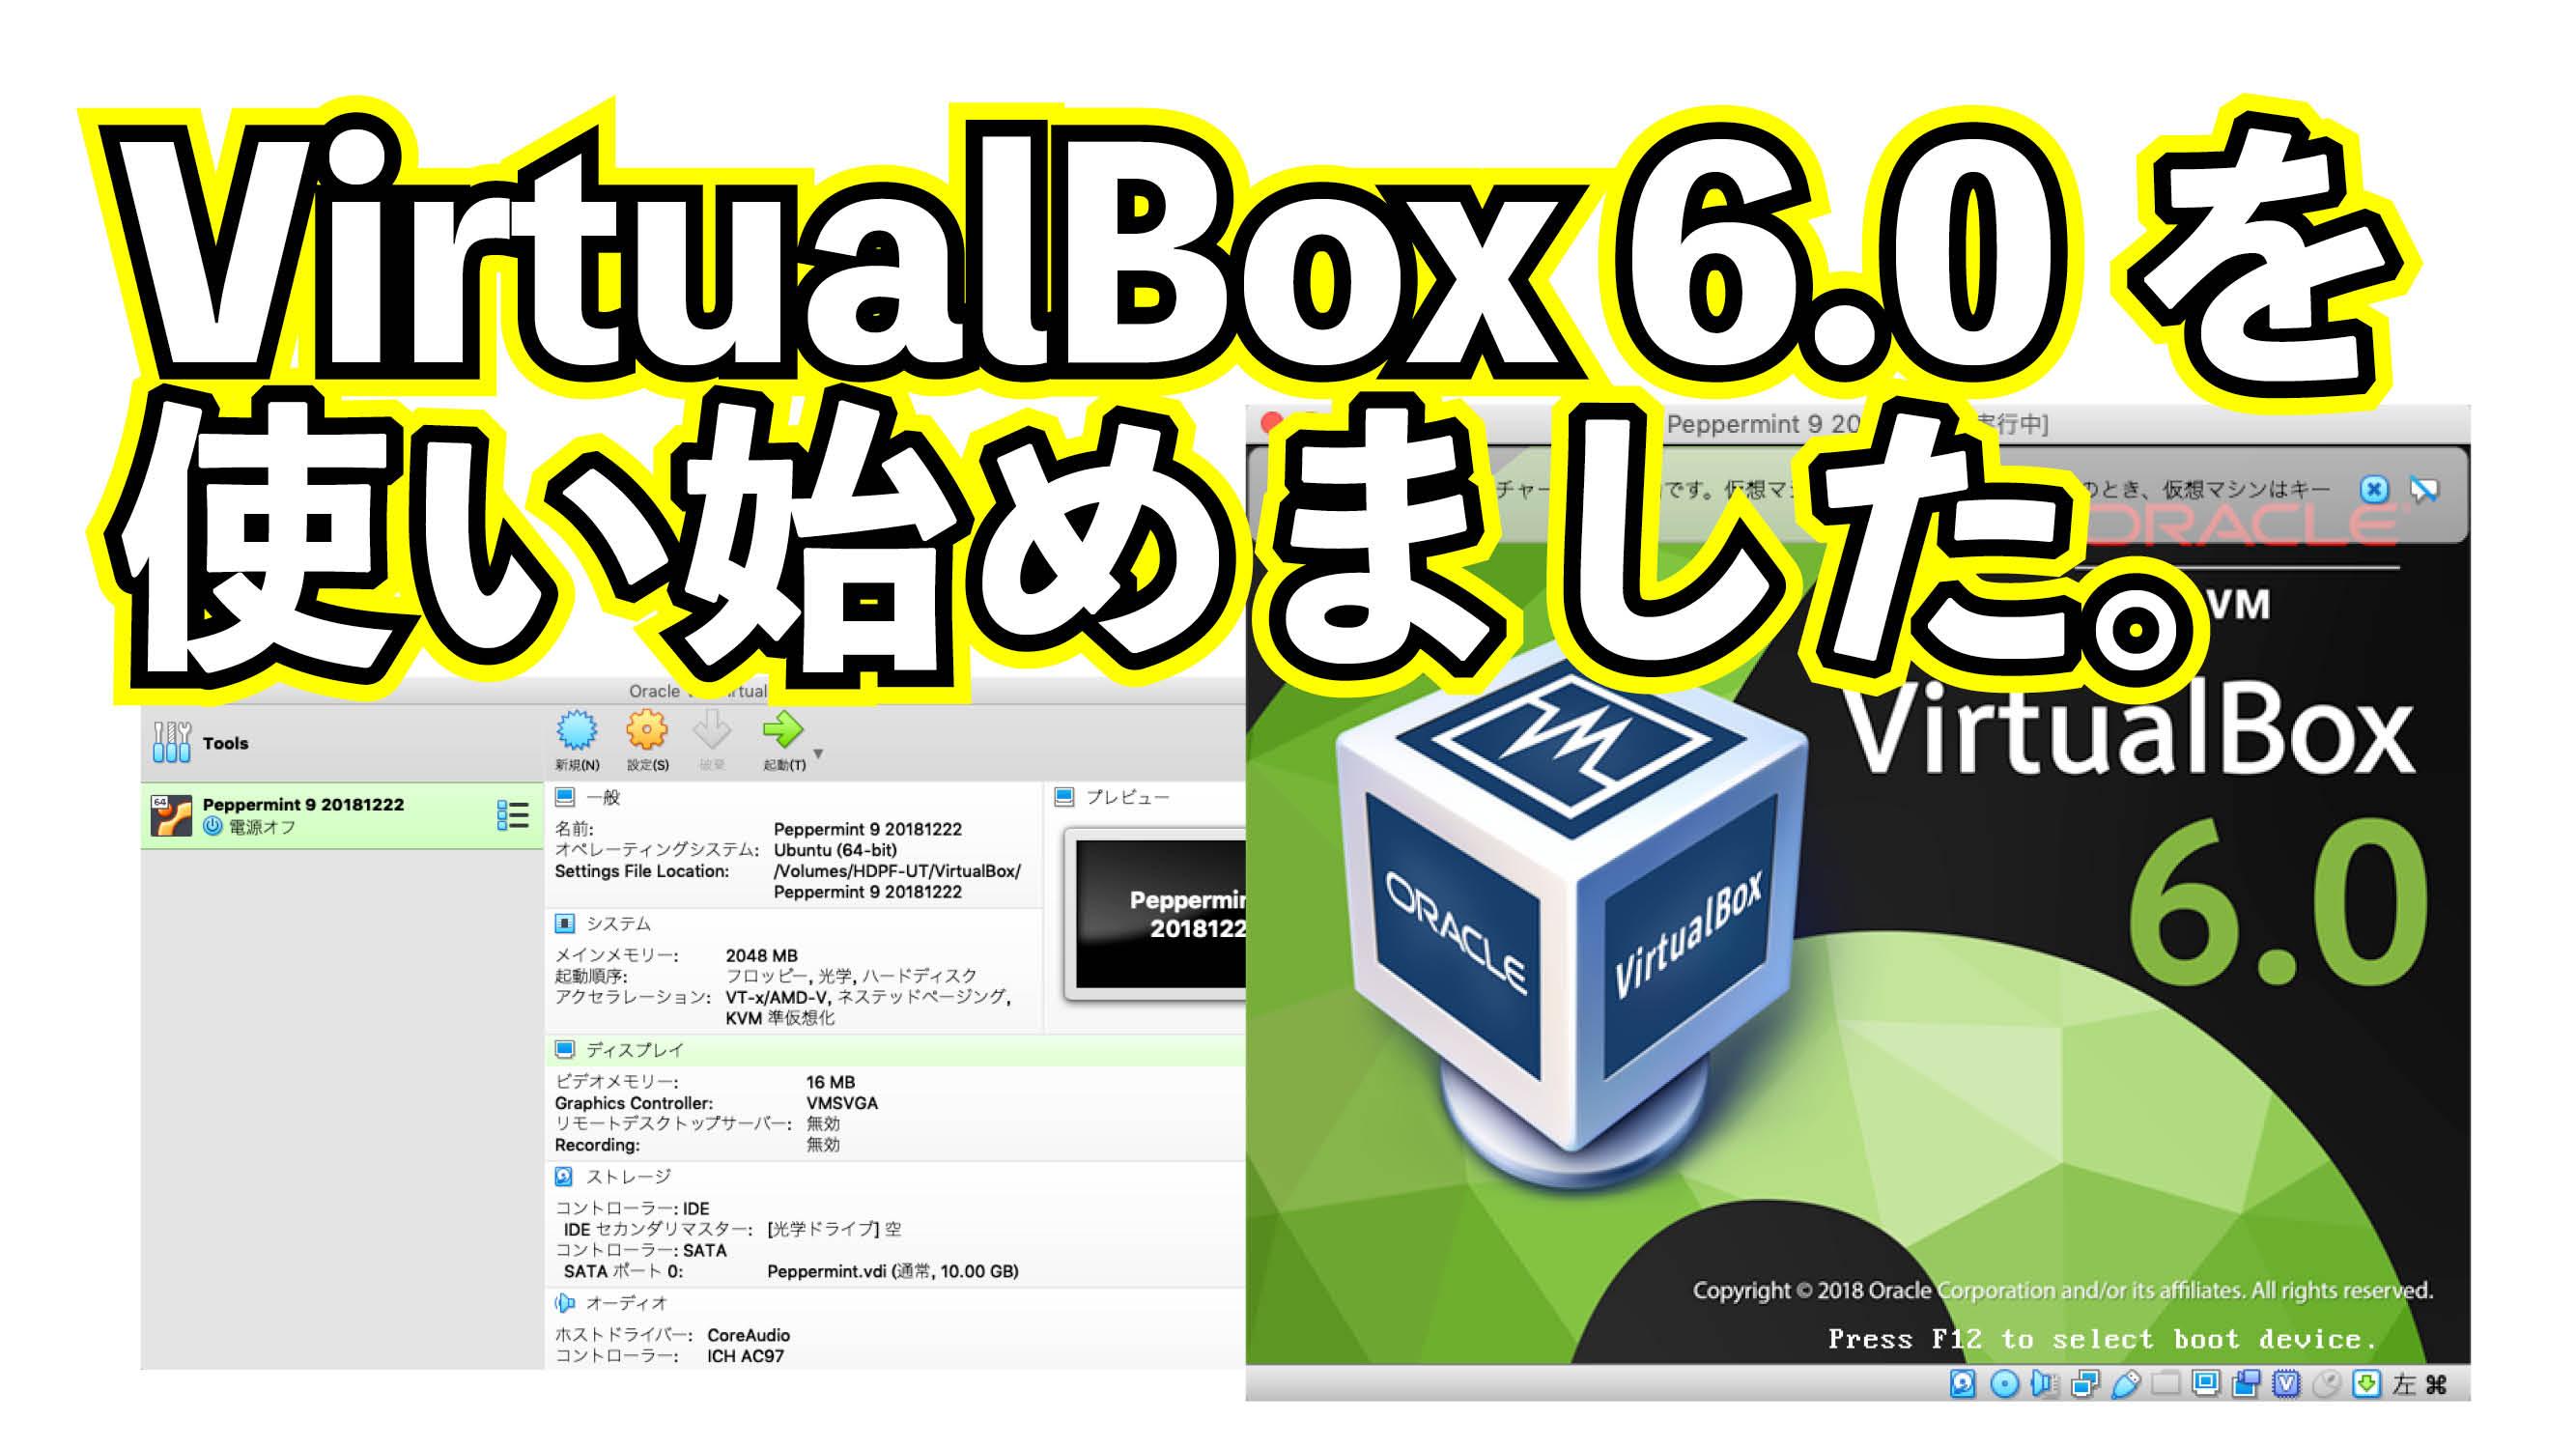 virtualbox 6.0 を使い始めました